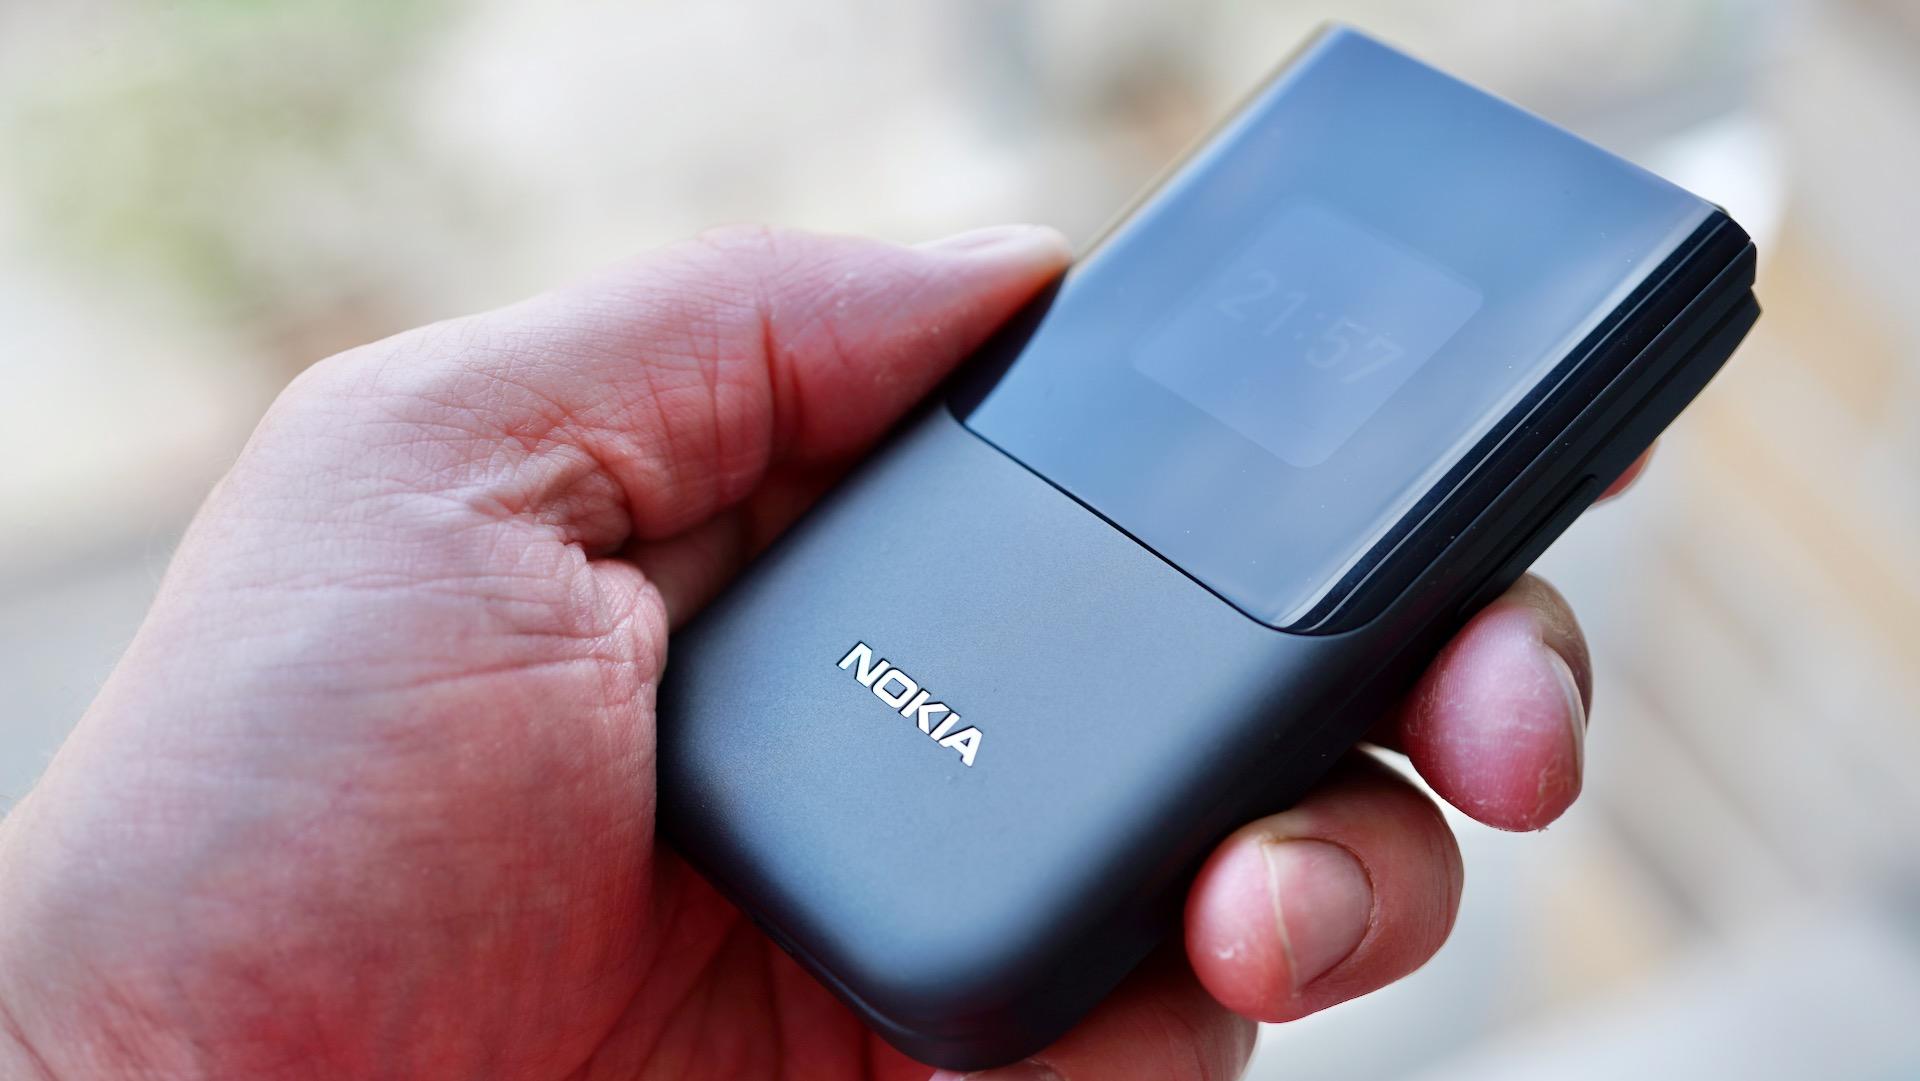 Nokia 2720 closed in hand